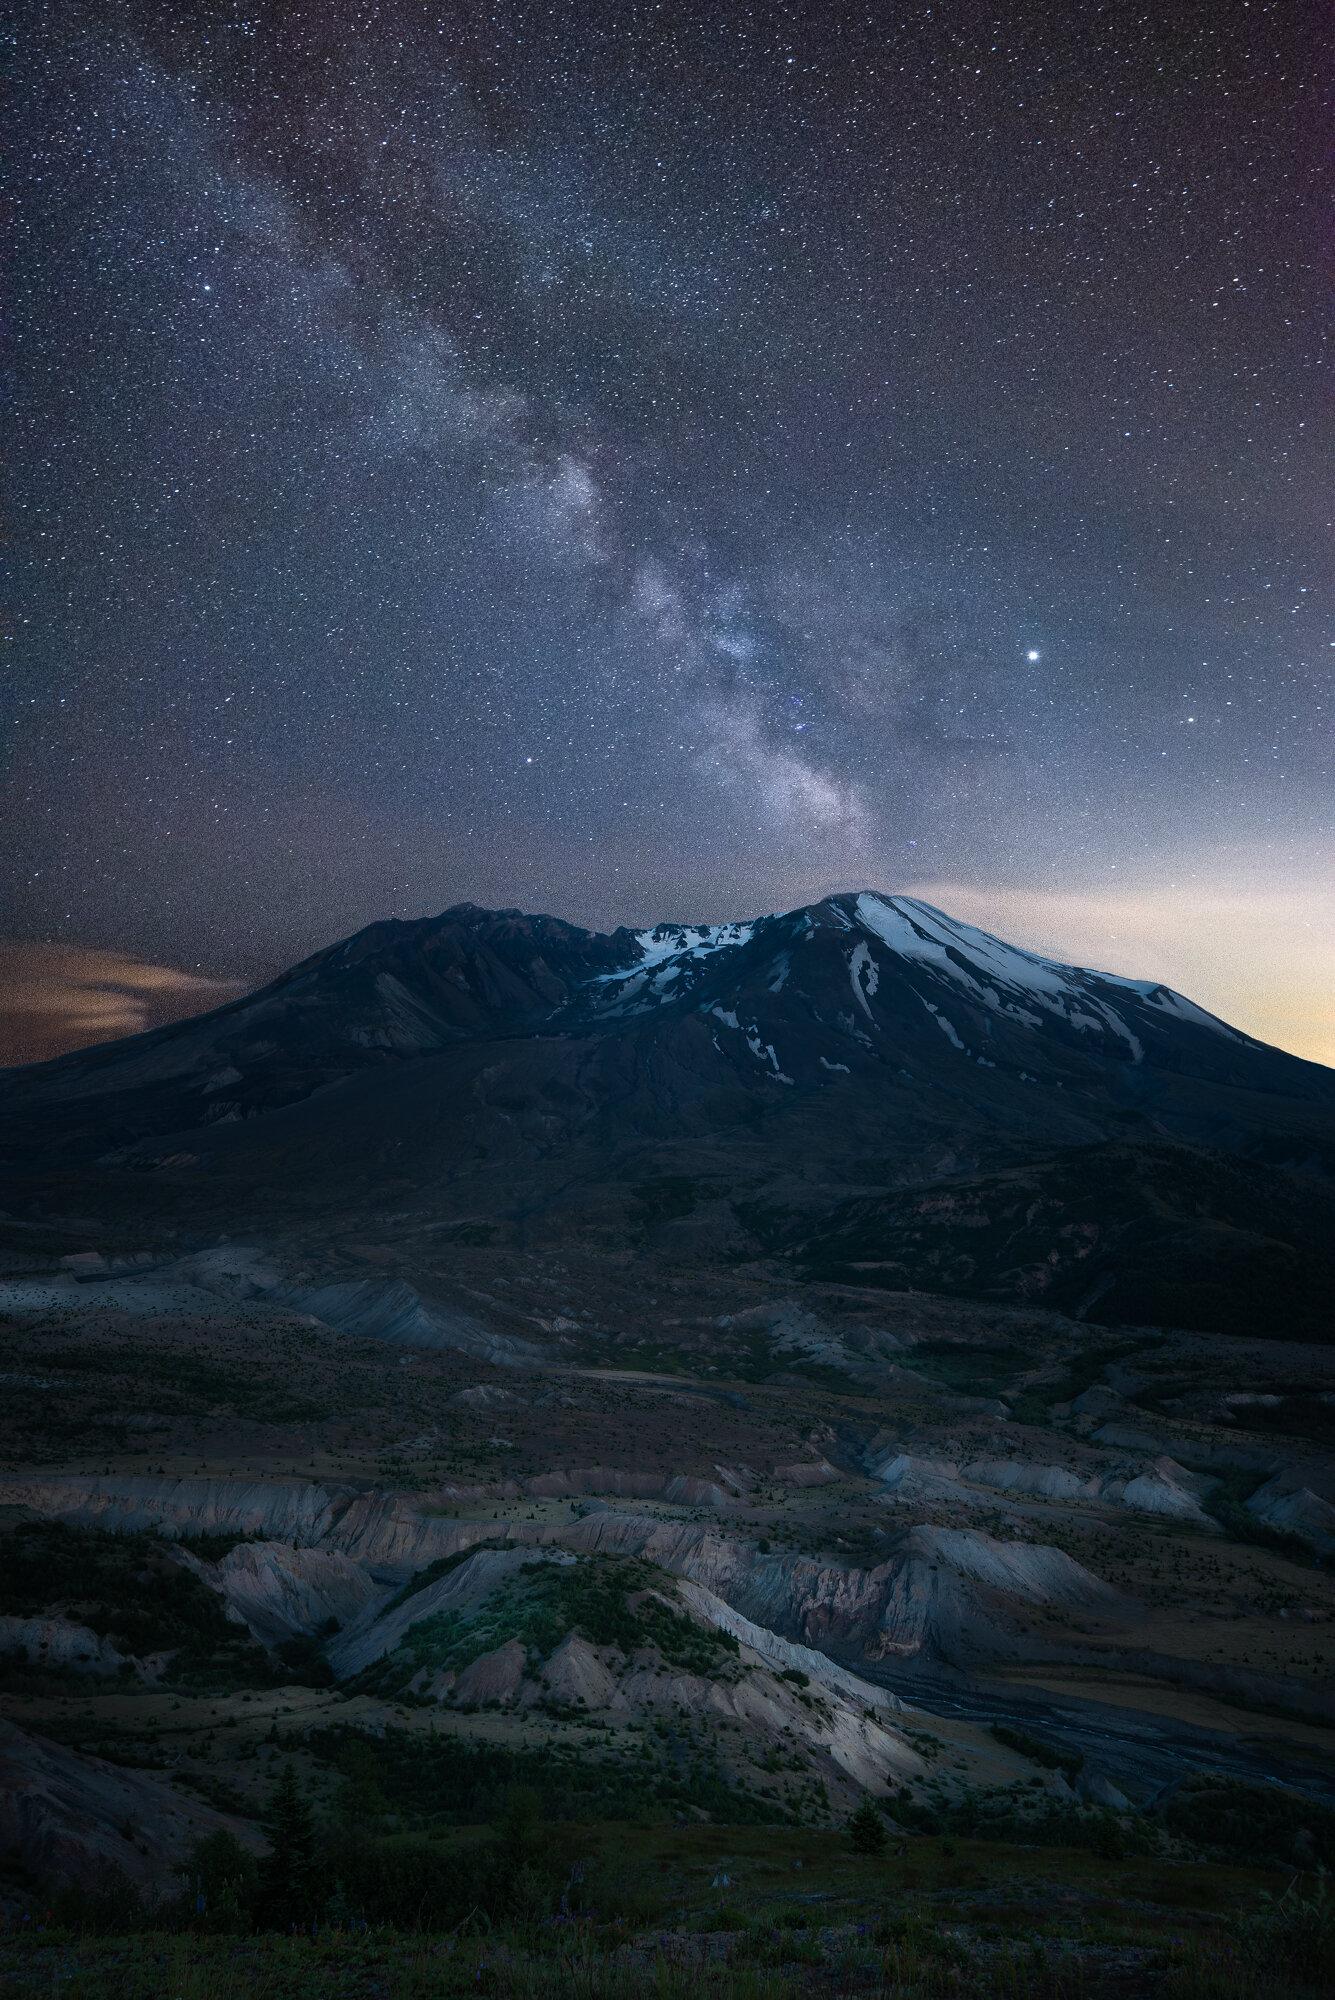 Mount St. Helens Photography: 'St. Helens under Starlight'